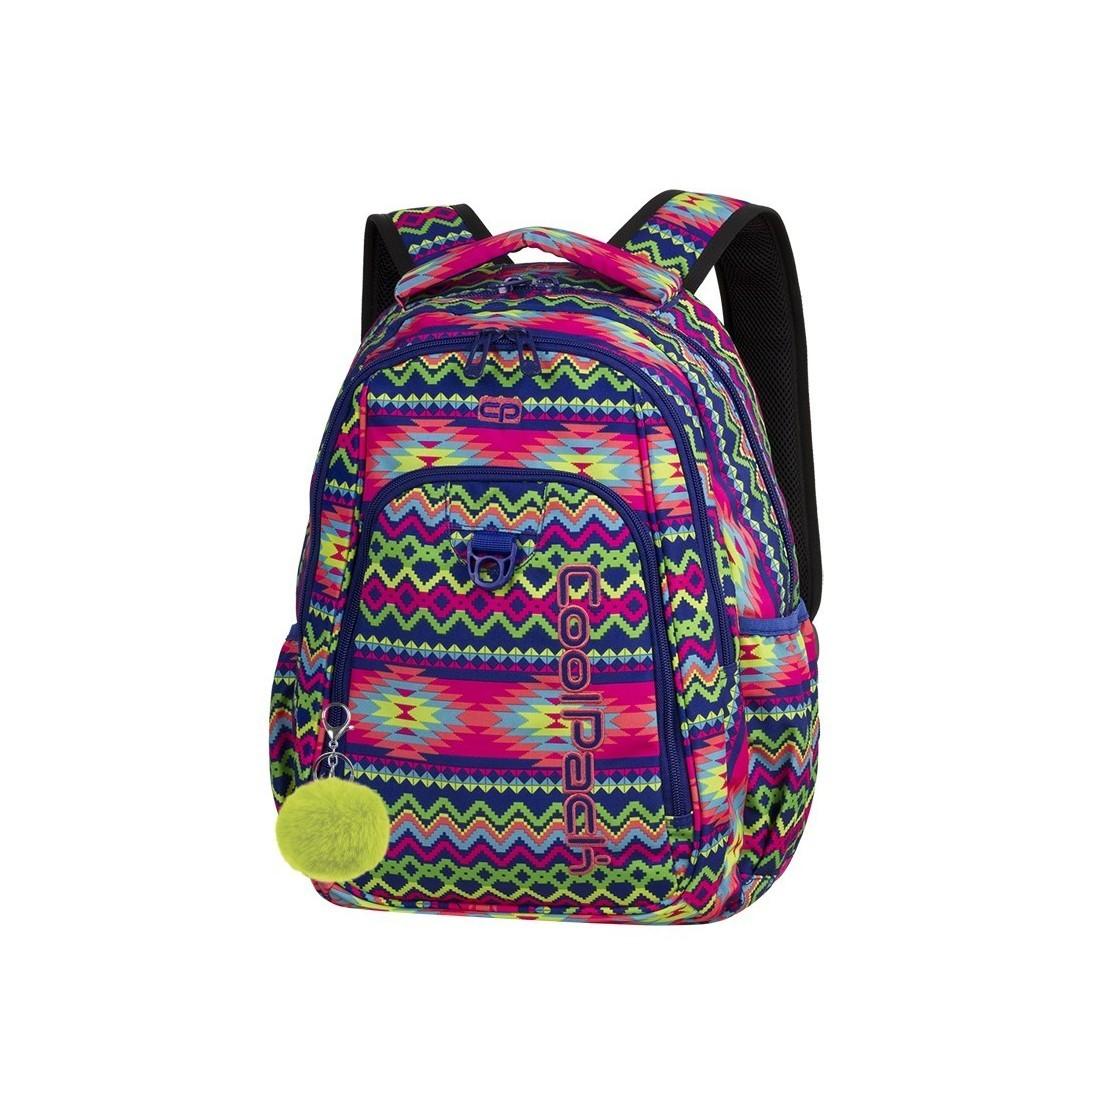 01fa71d641e97 Plecak szkolny CoolPack CP STRIKE BOHO ELECTRA kolorowe zygzaki dla  nastolatki - 781+ GRATIS POMPON